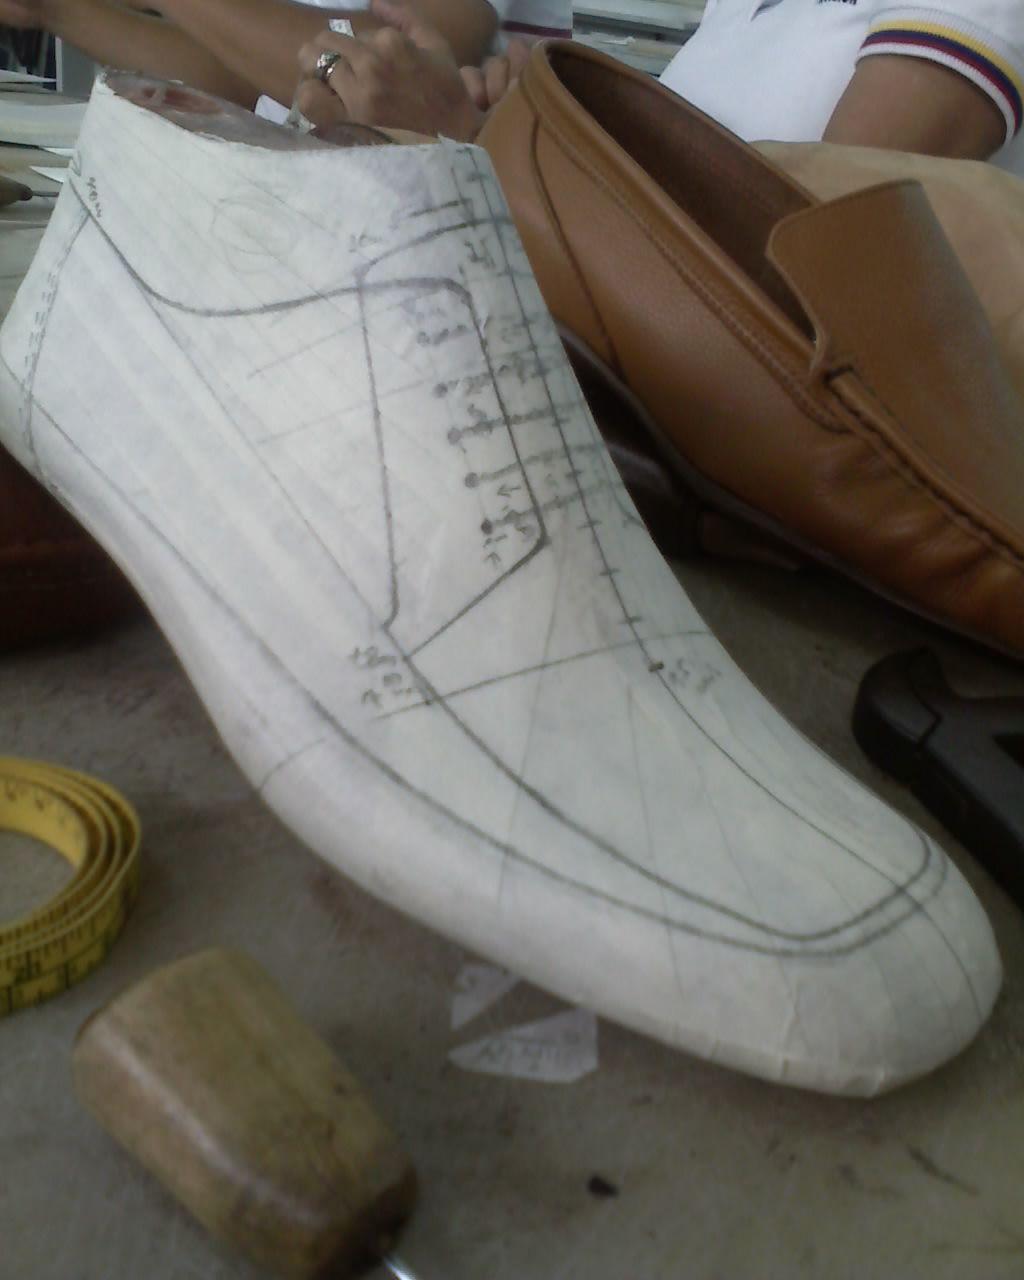 Dise o y modelaje de calzado calzado zapatos y zapateras for Diseno de zapatos